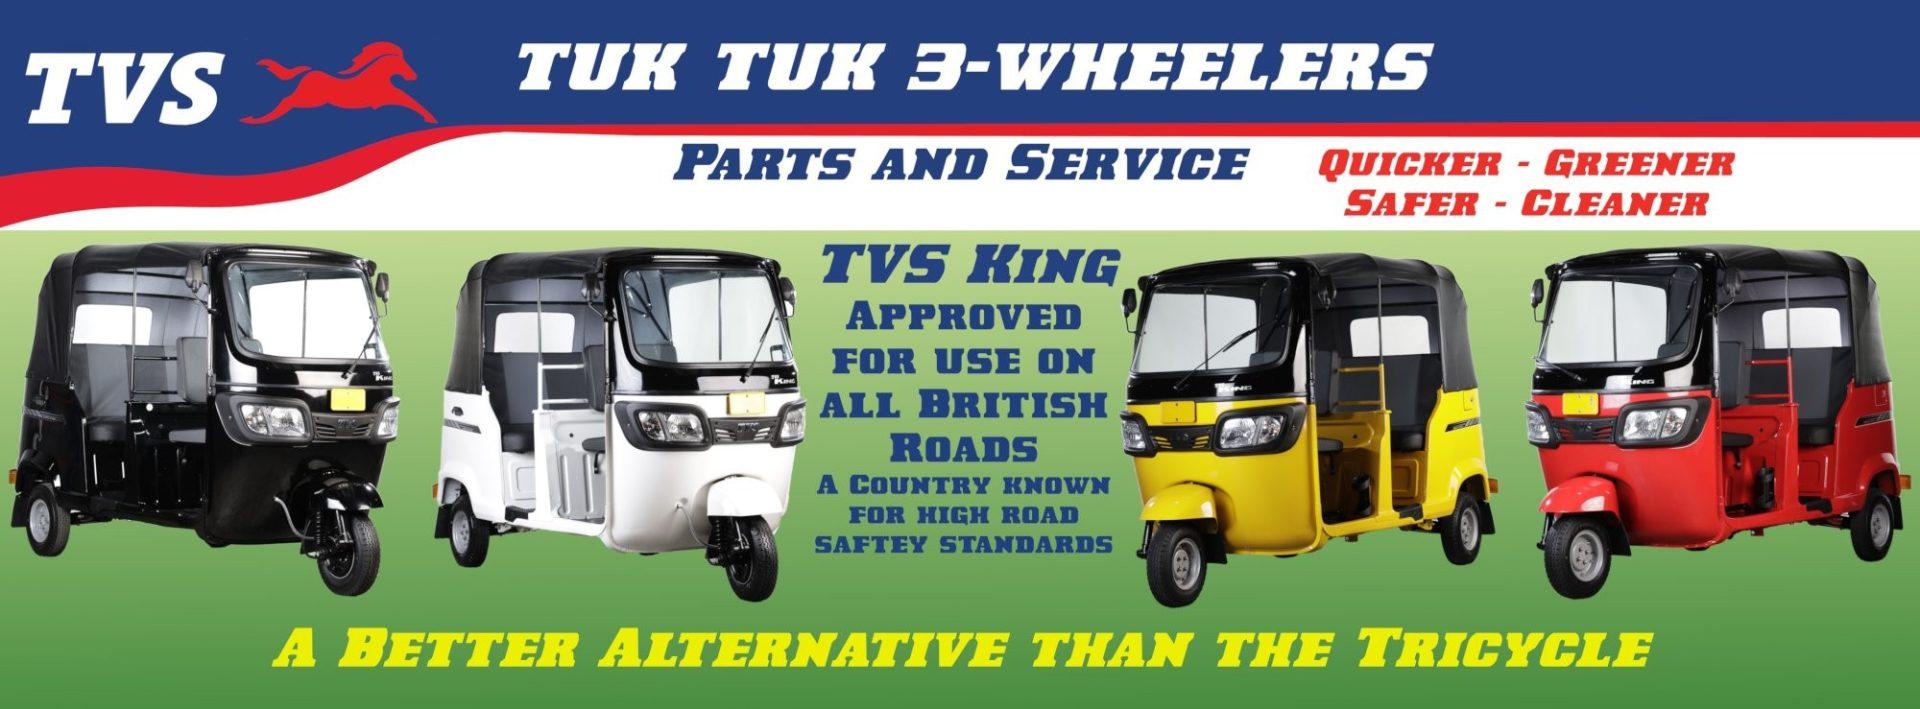 TVS King Tricycle